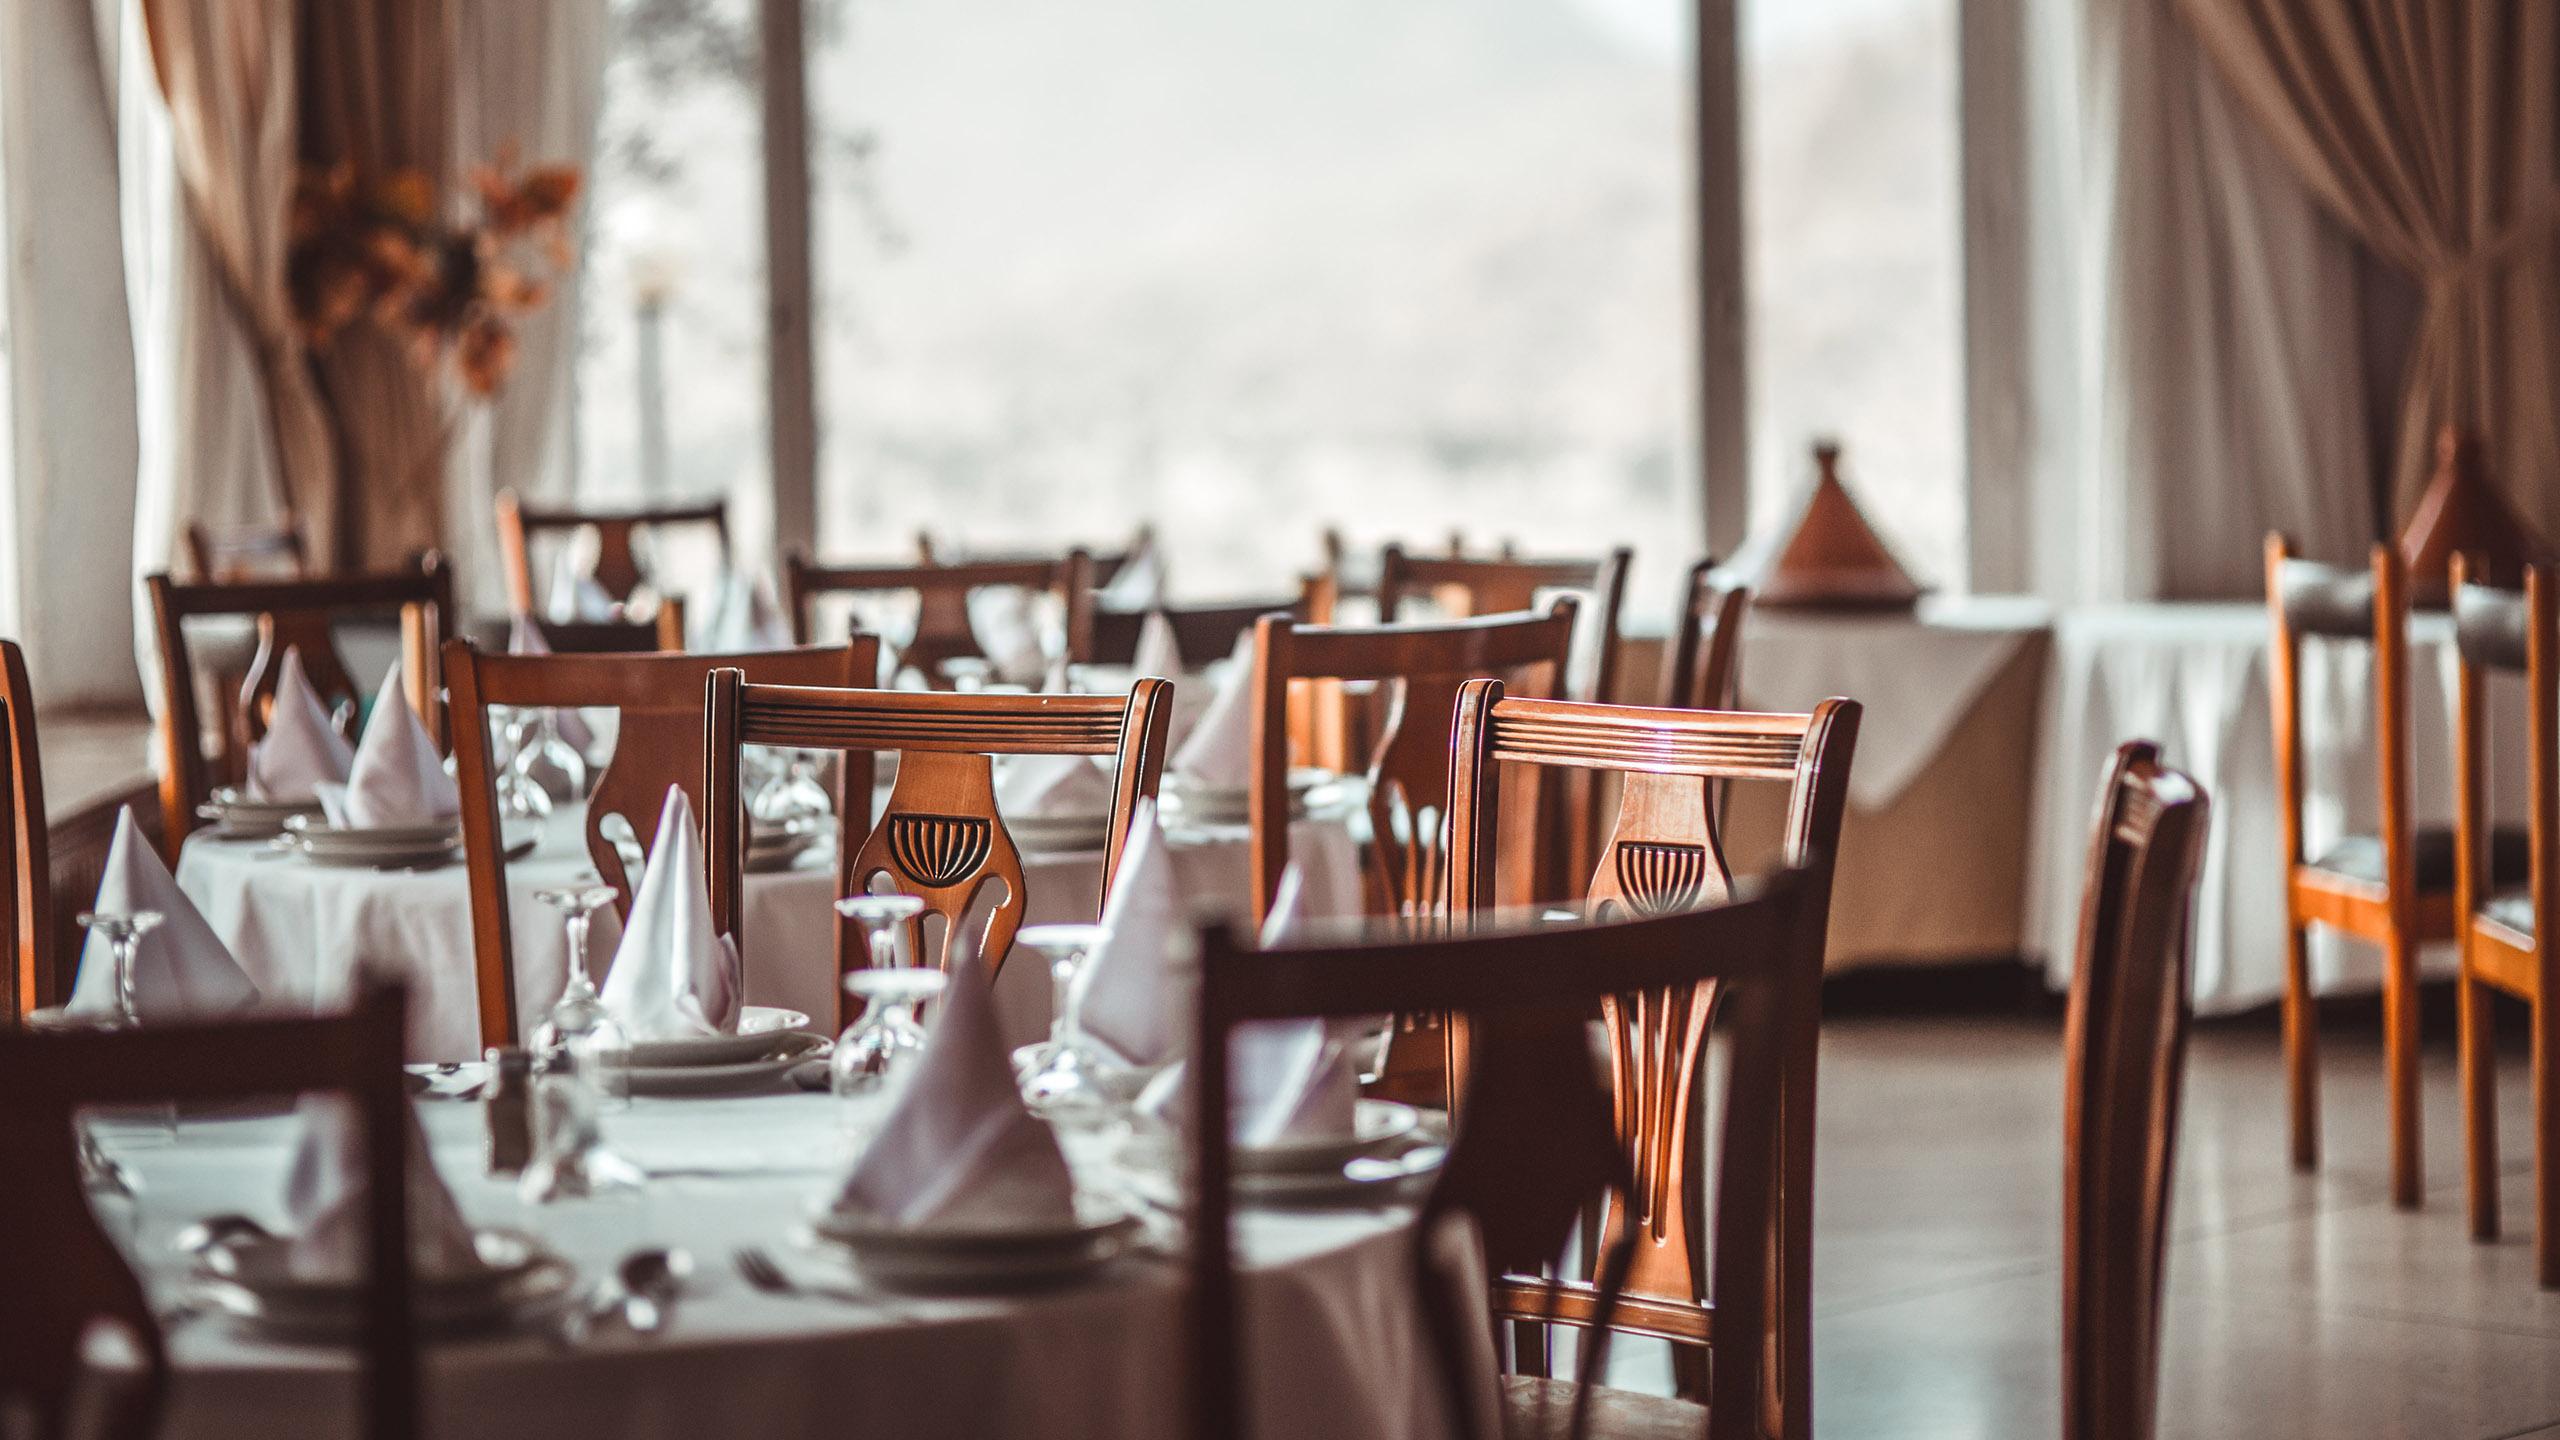 apertura de restaurantes, regreso de restaurantes, covid19